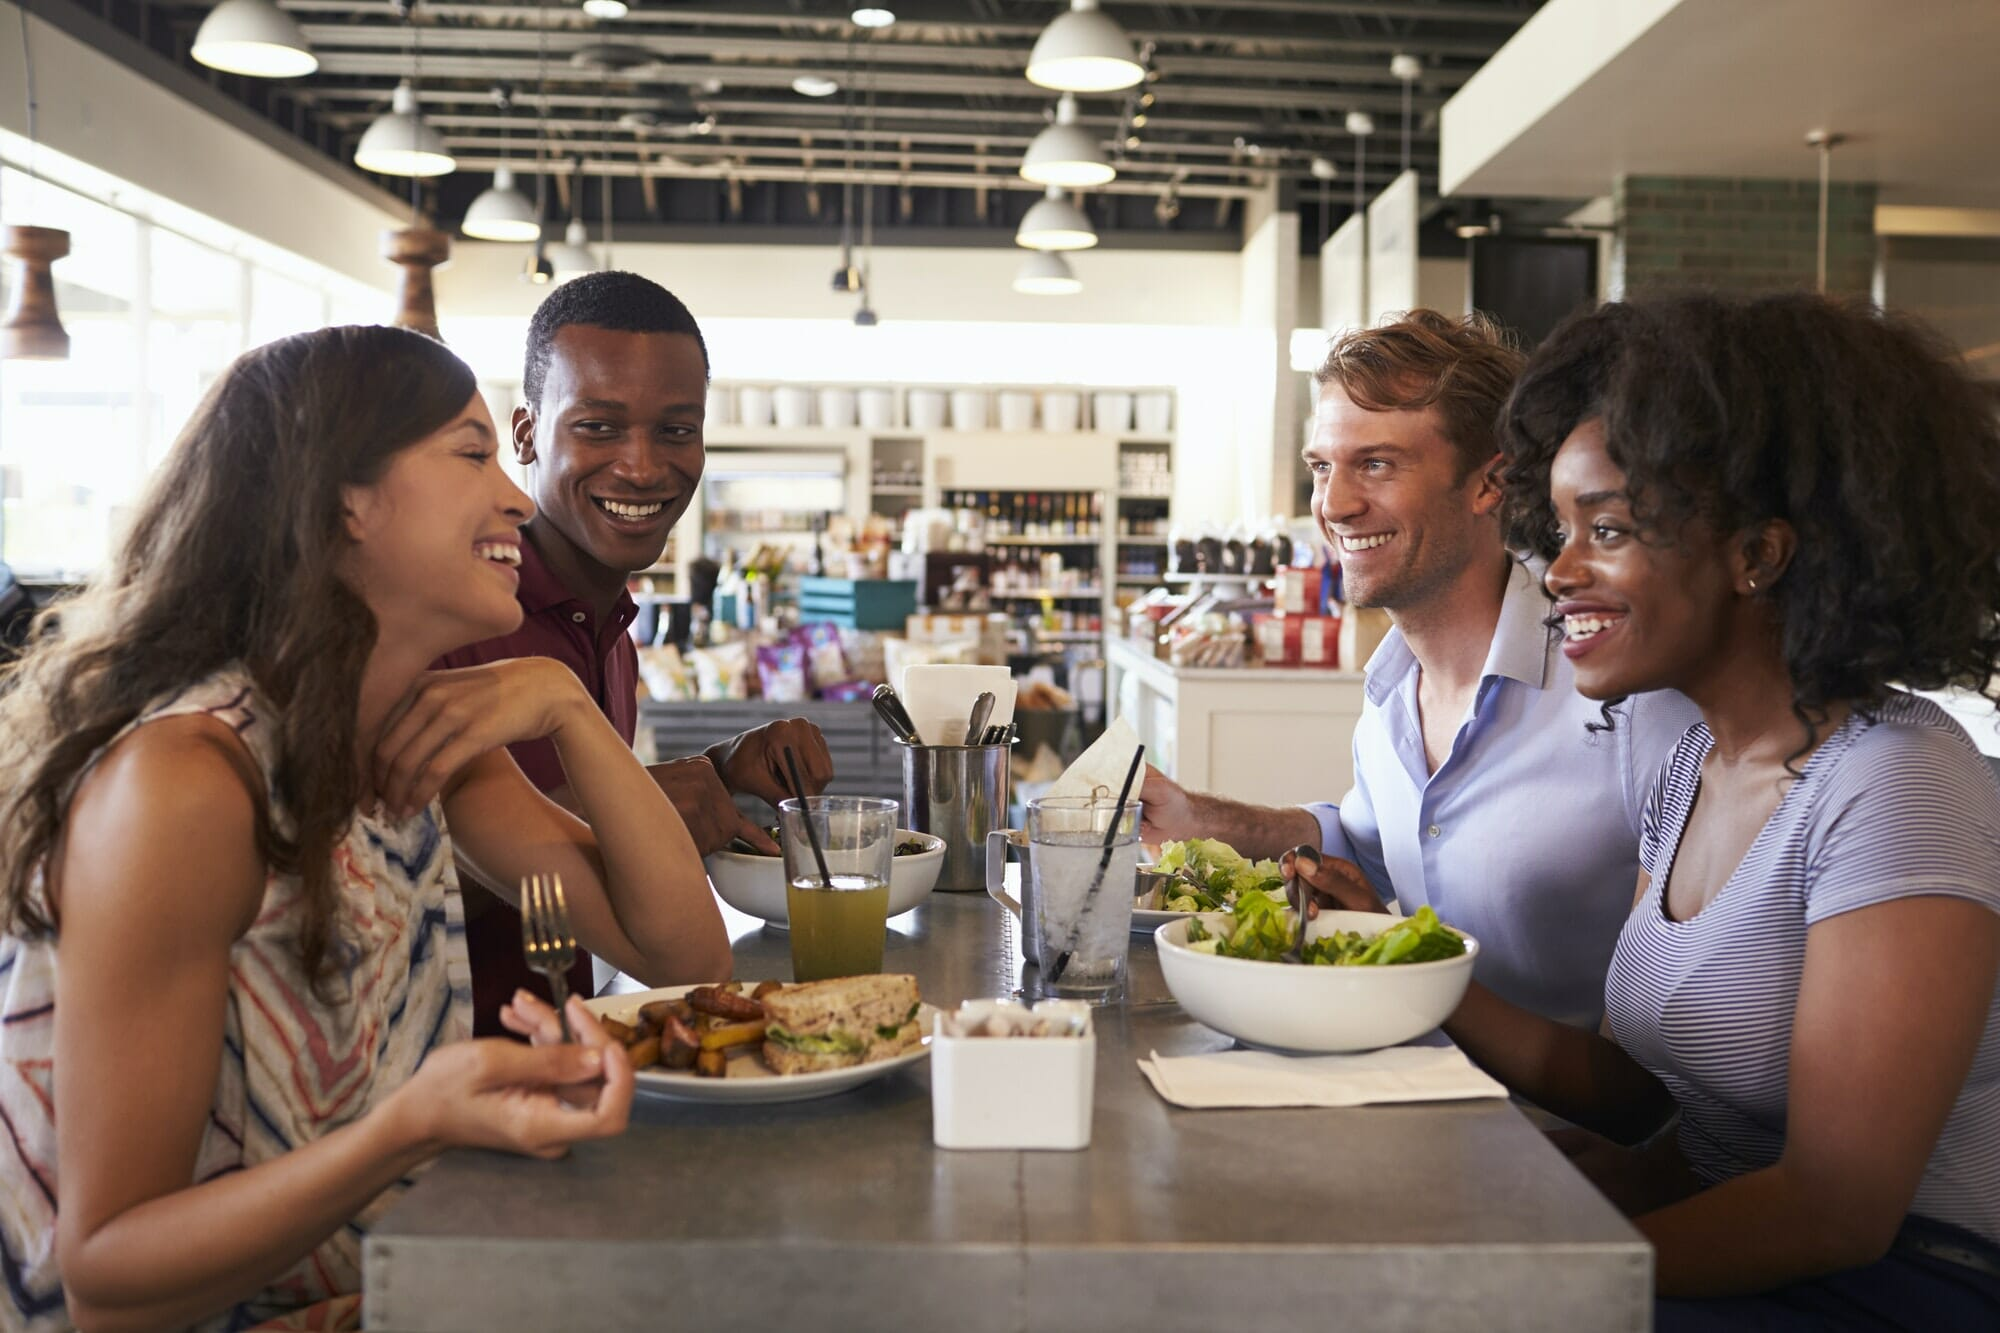 Friends Enjoying Lunch Date In Delicatessen Restaurant